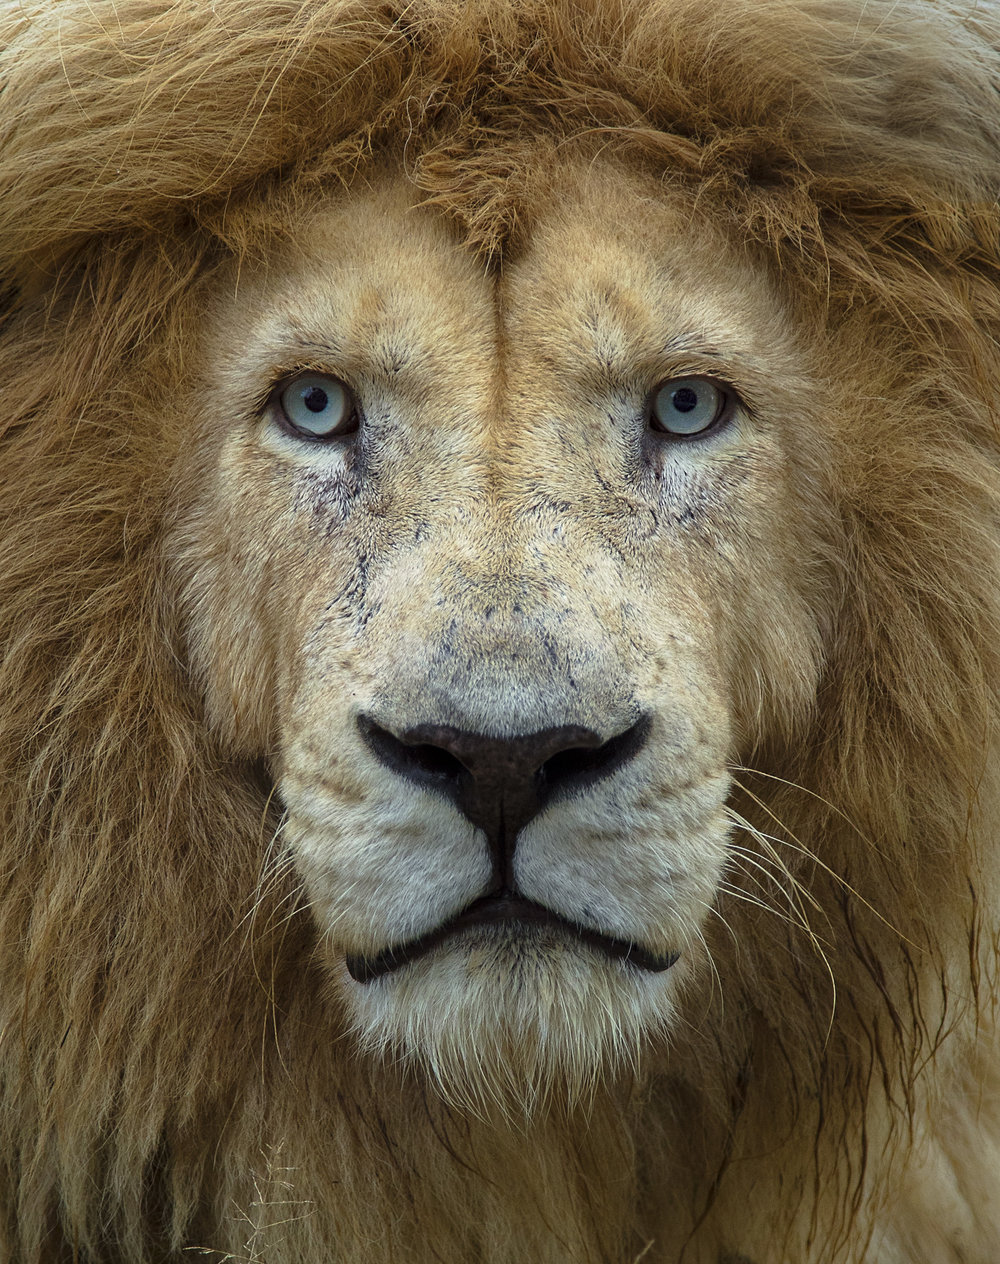 Simon+Needham+Humanitarian+Photography+Lions+of+Africa+19.jpg